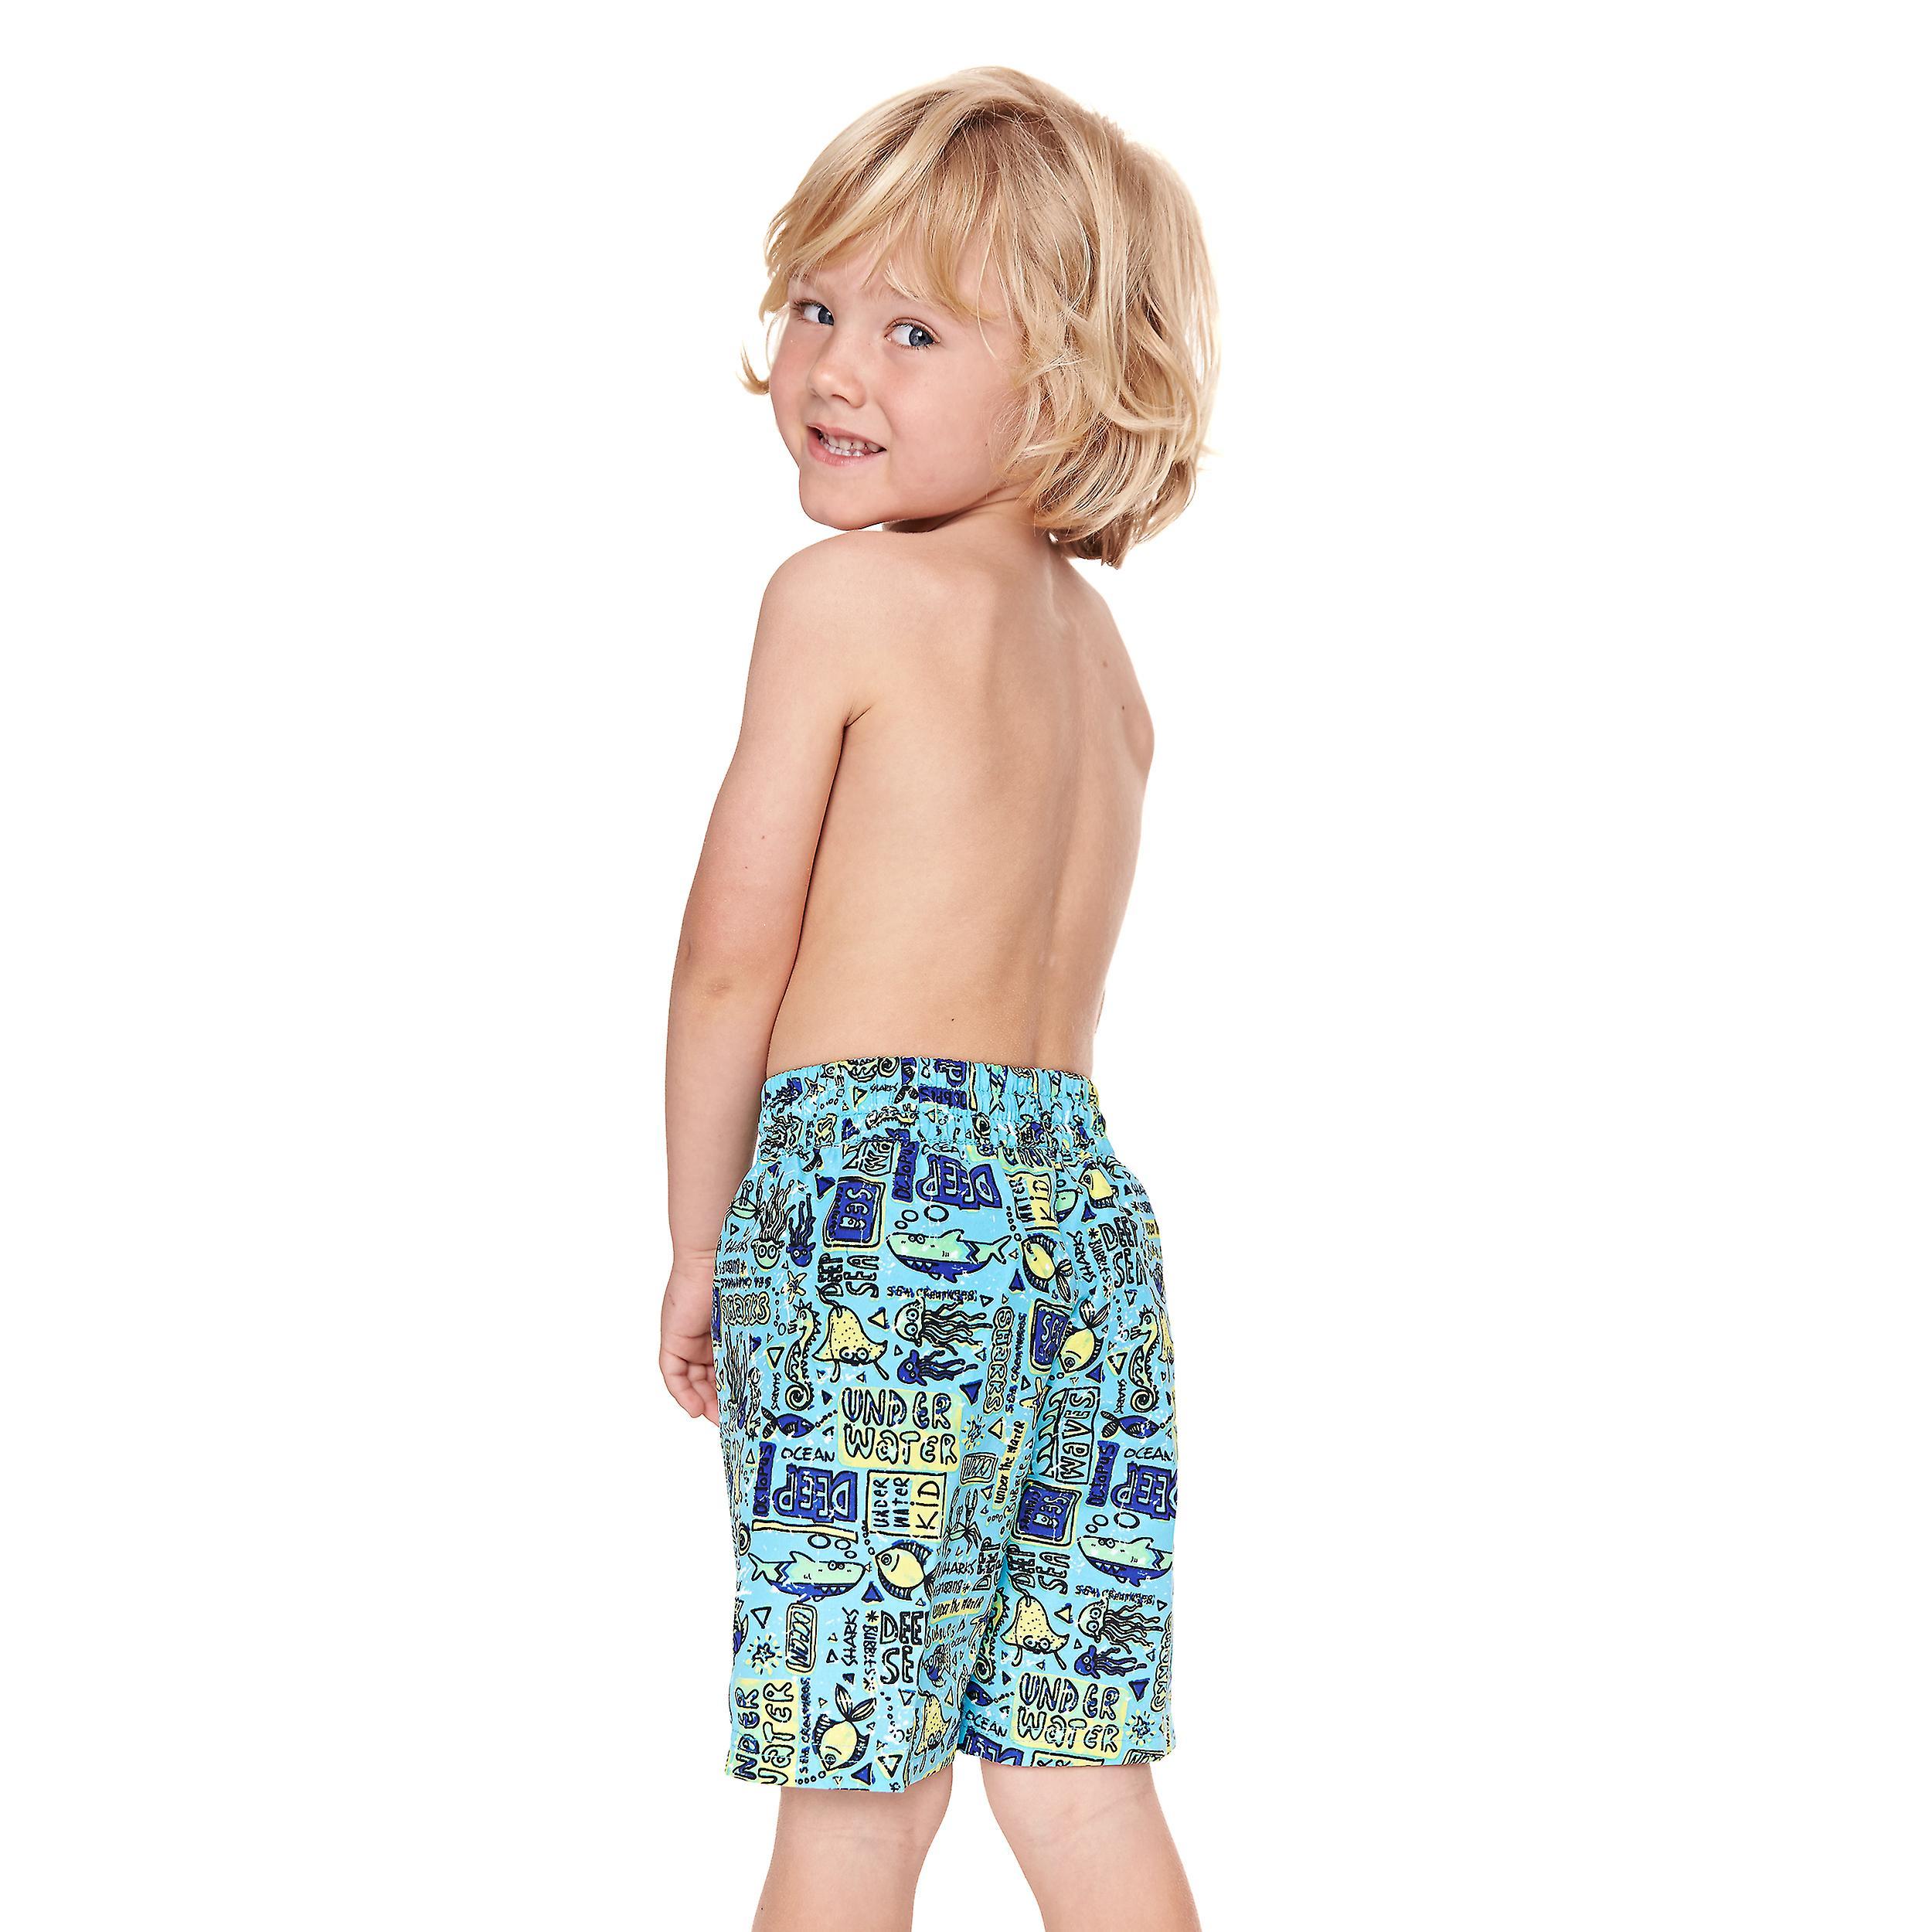 bd83faddb47e5 Zoggs Junior Boy's Swimming Shorts in Jade / Multi Colour - Chlorine  Resistant for 6-